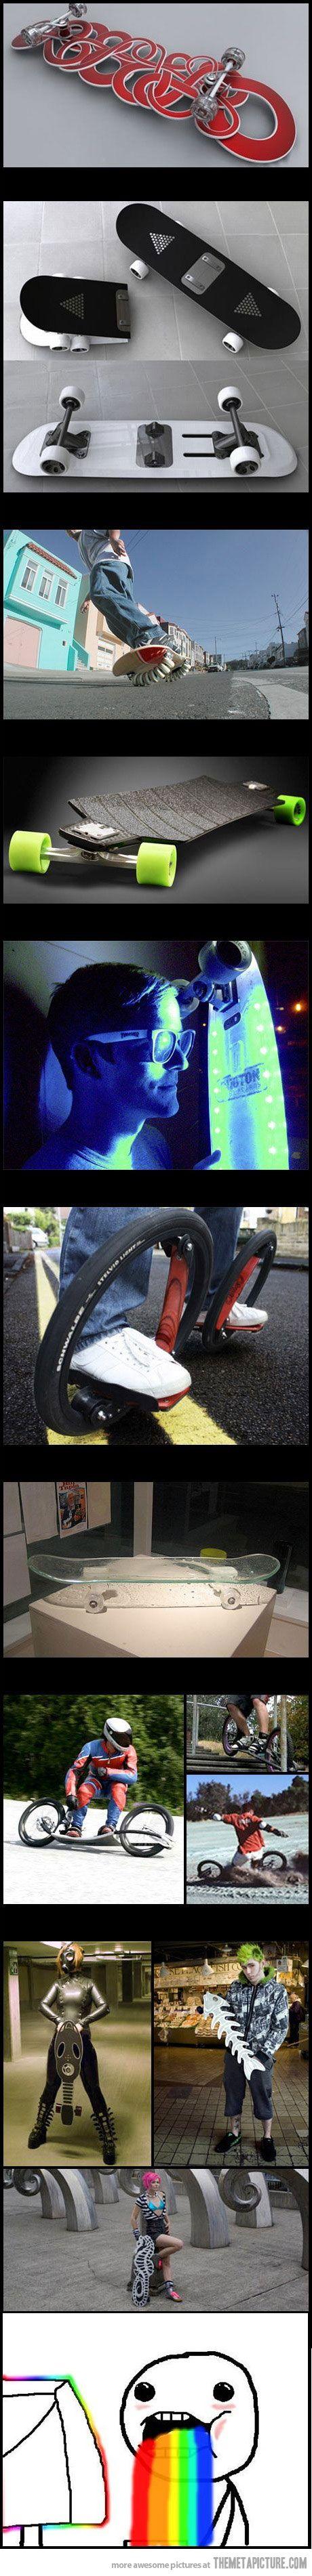 Amazing skateboard designs!